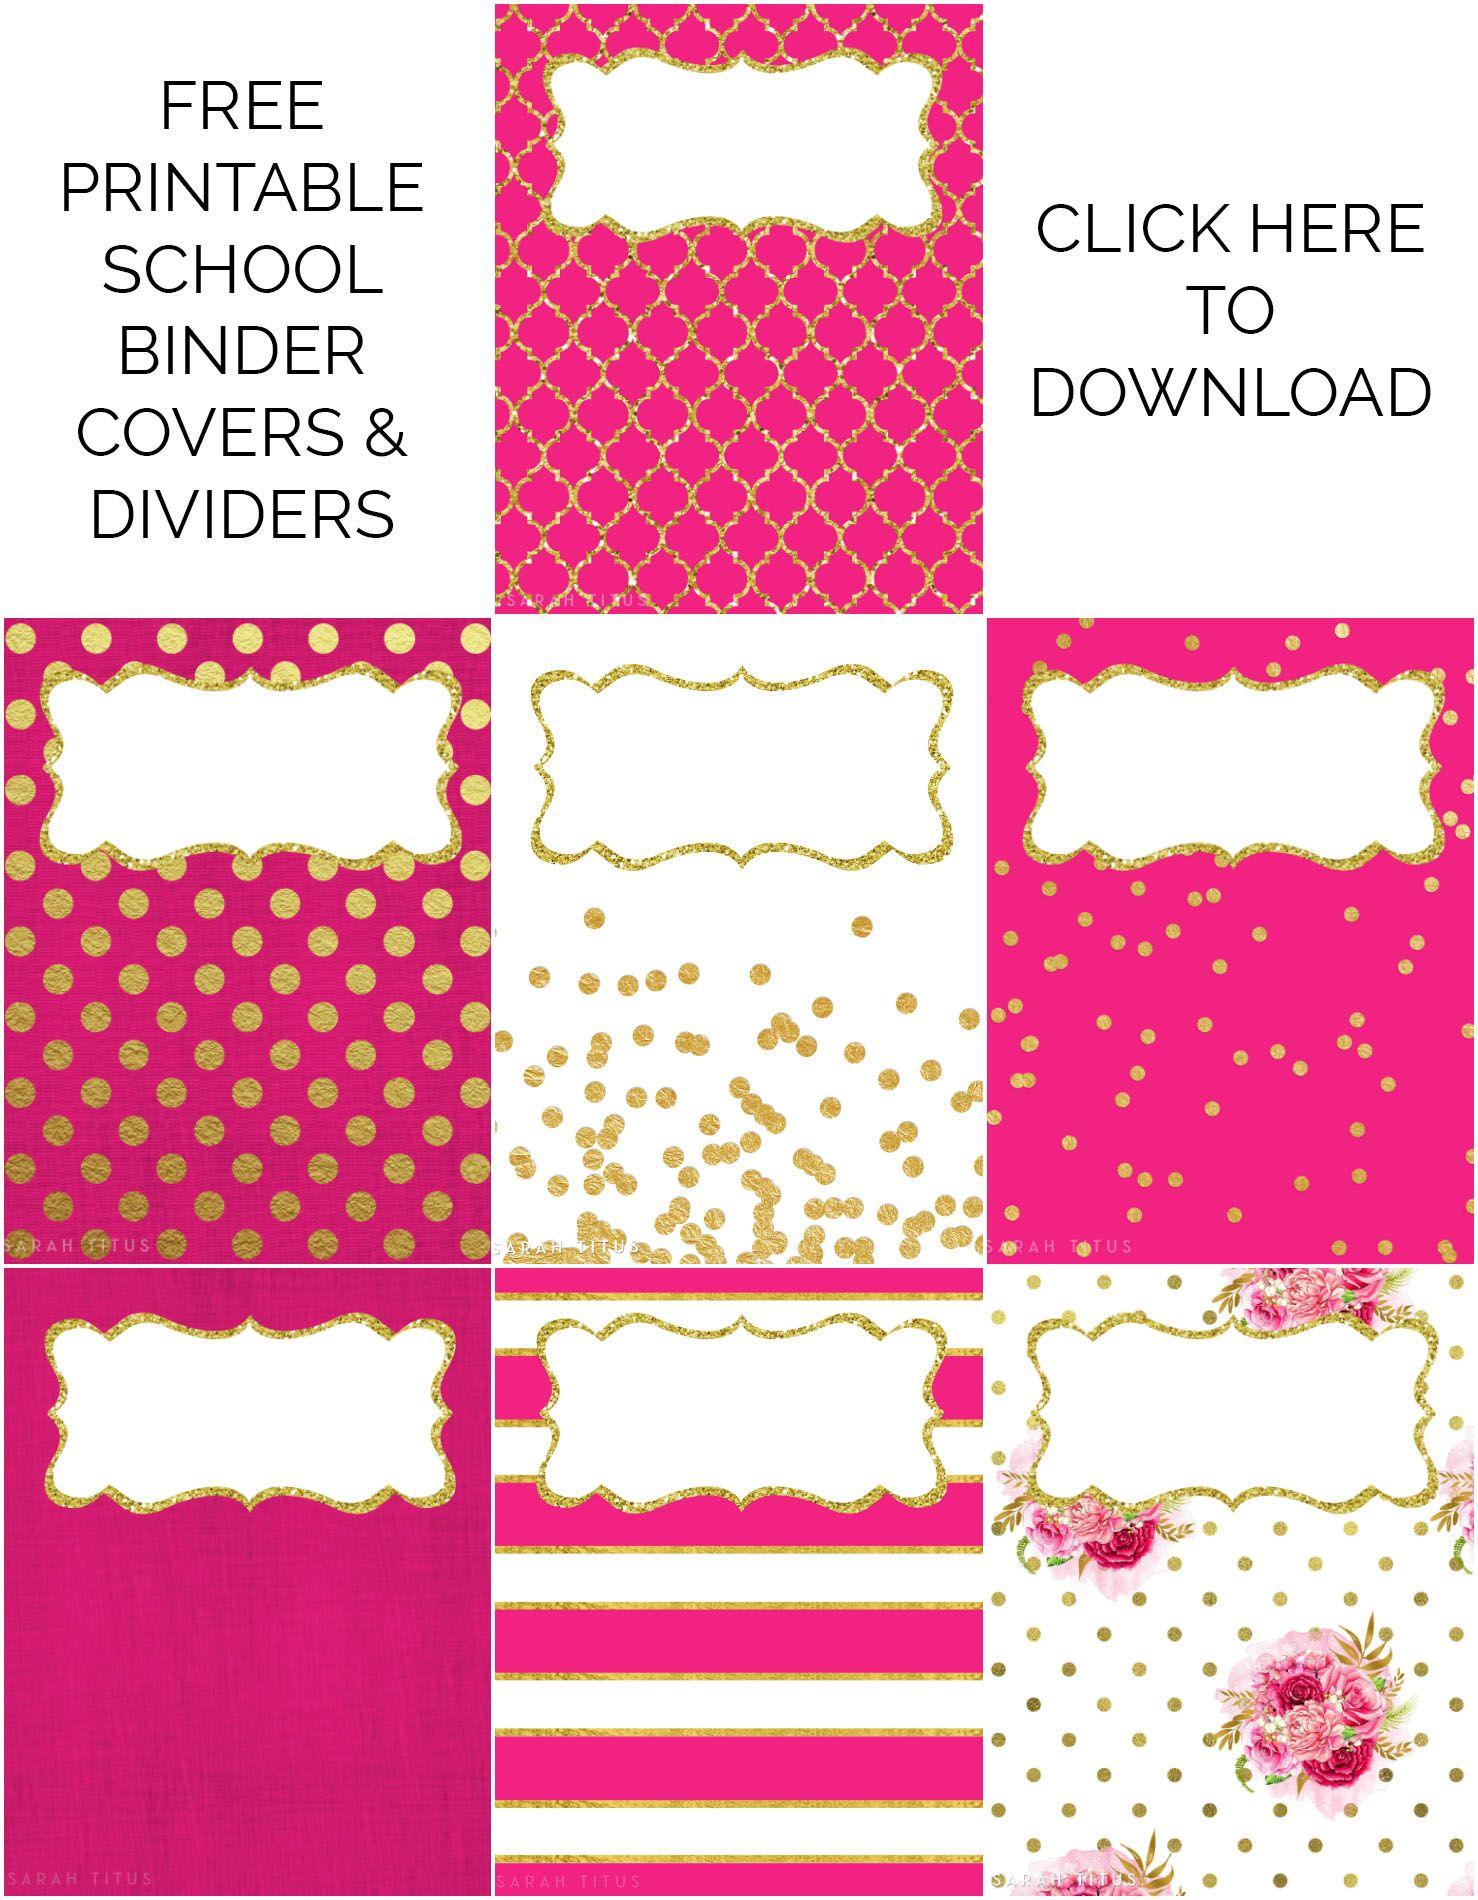 Binder Covers / Dividers Free Printables | Plans | Binder, Binder - Free Printable School Binder Covers